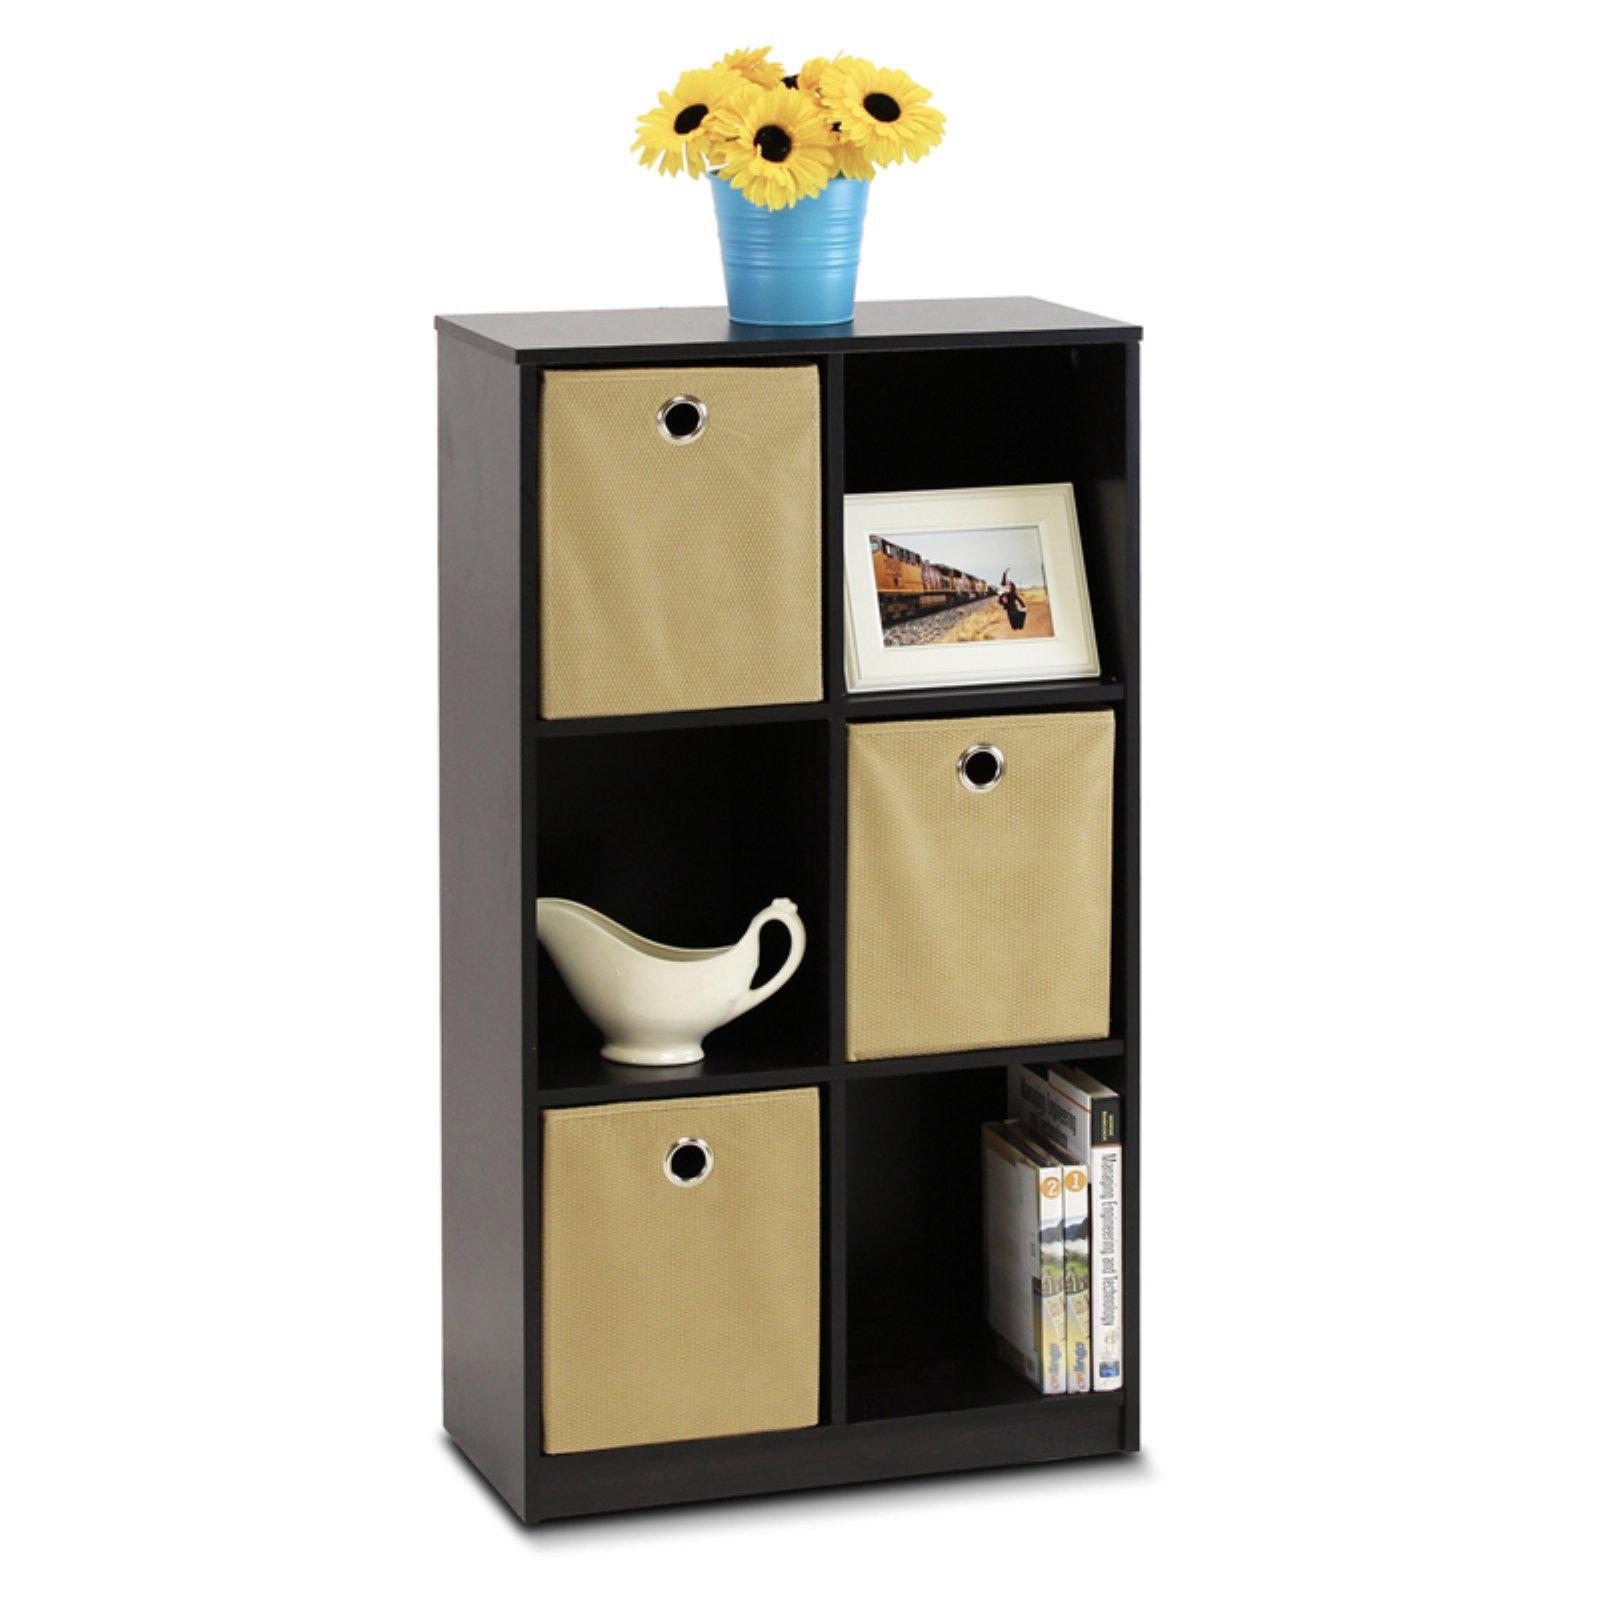 Furinno 13087EX/LB Econ Storage Organizer Bookcase with Bins, Espresso/Light Brown